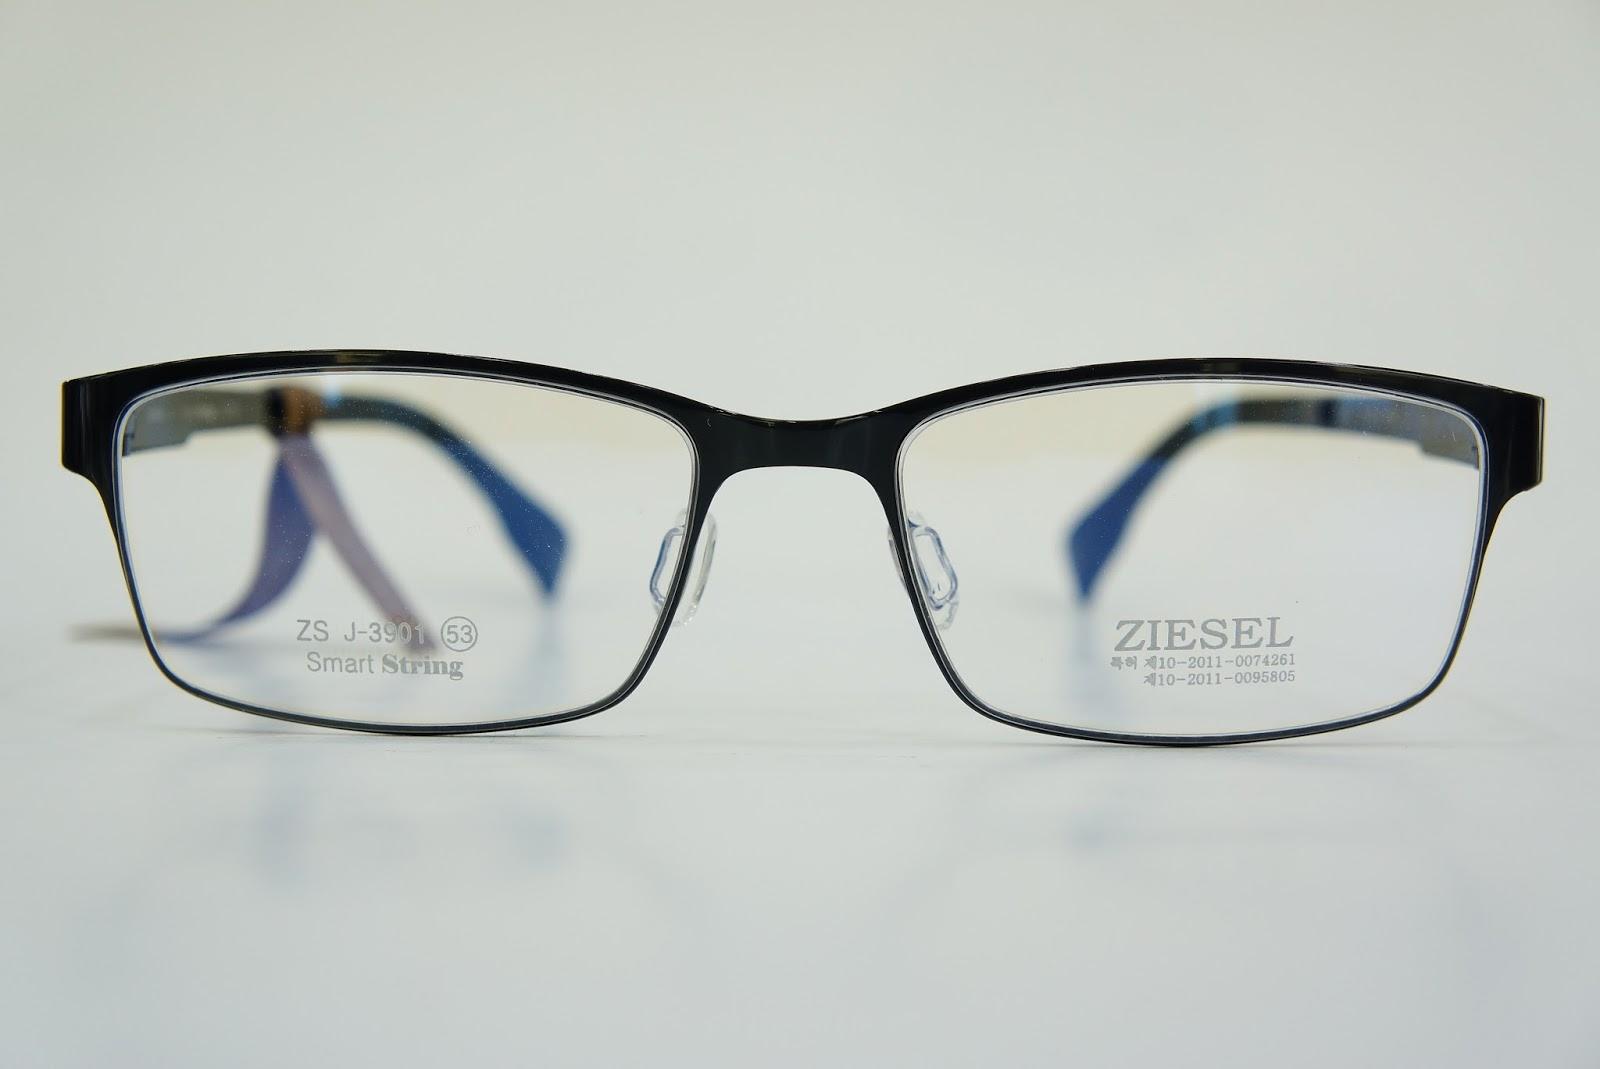 fe482af8a6b 지적이고 깔끔한 스타일을 연출 할 수 있는 안경